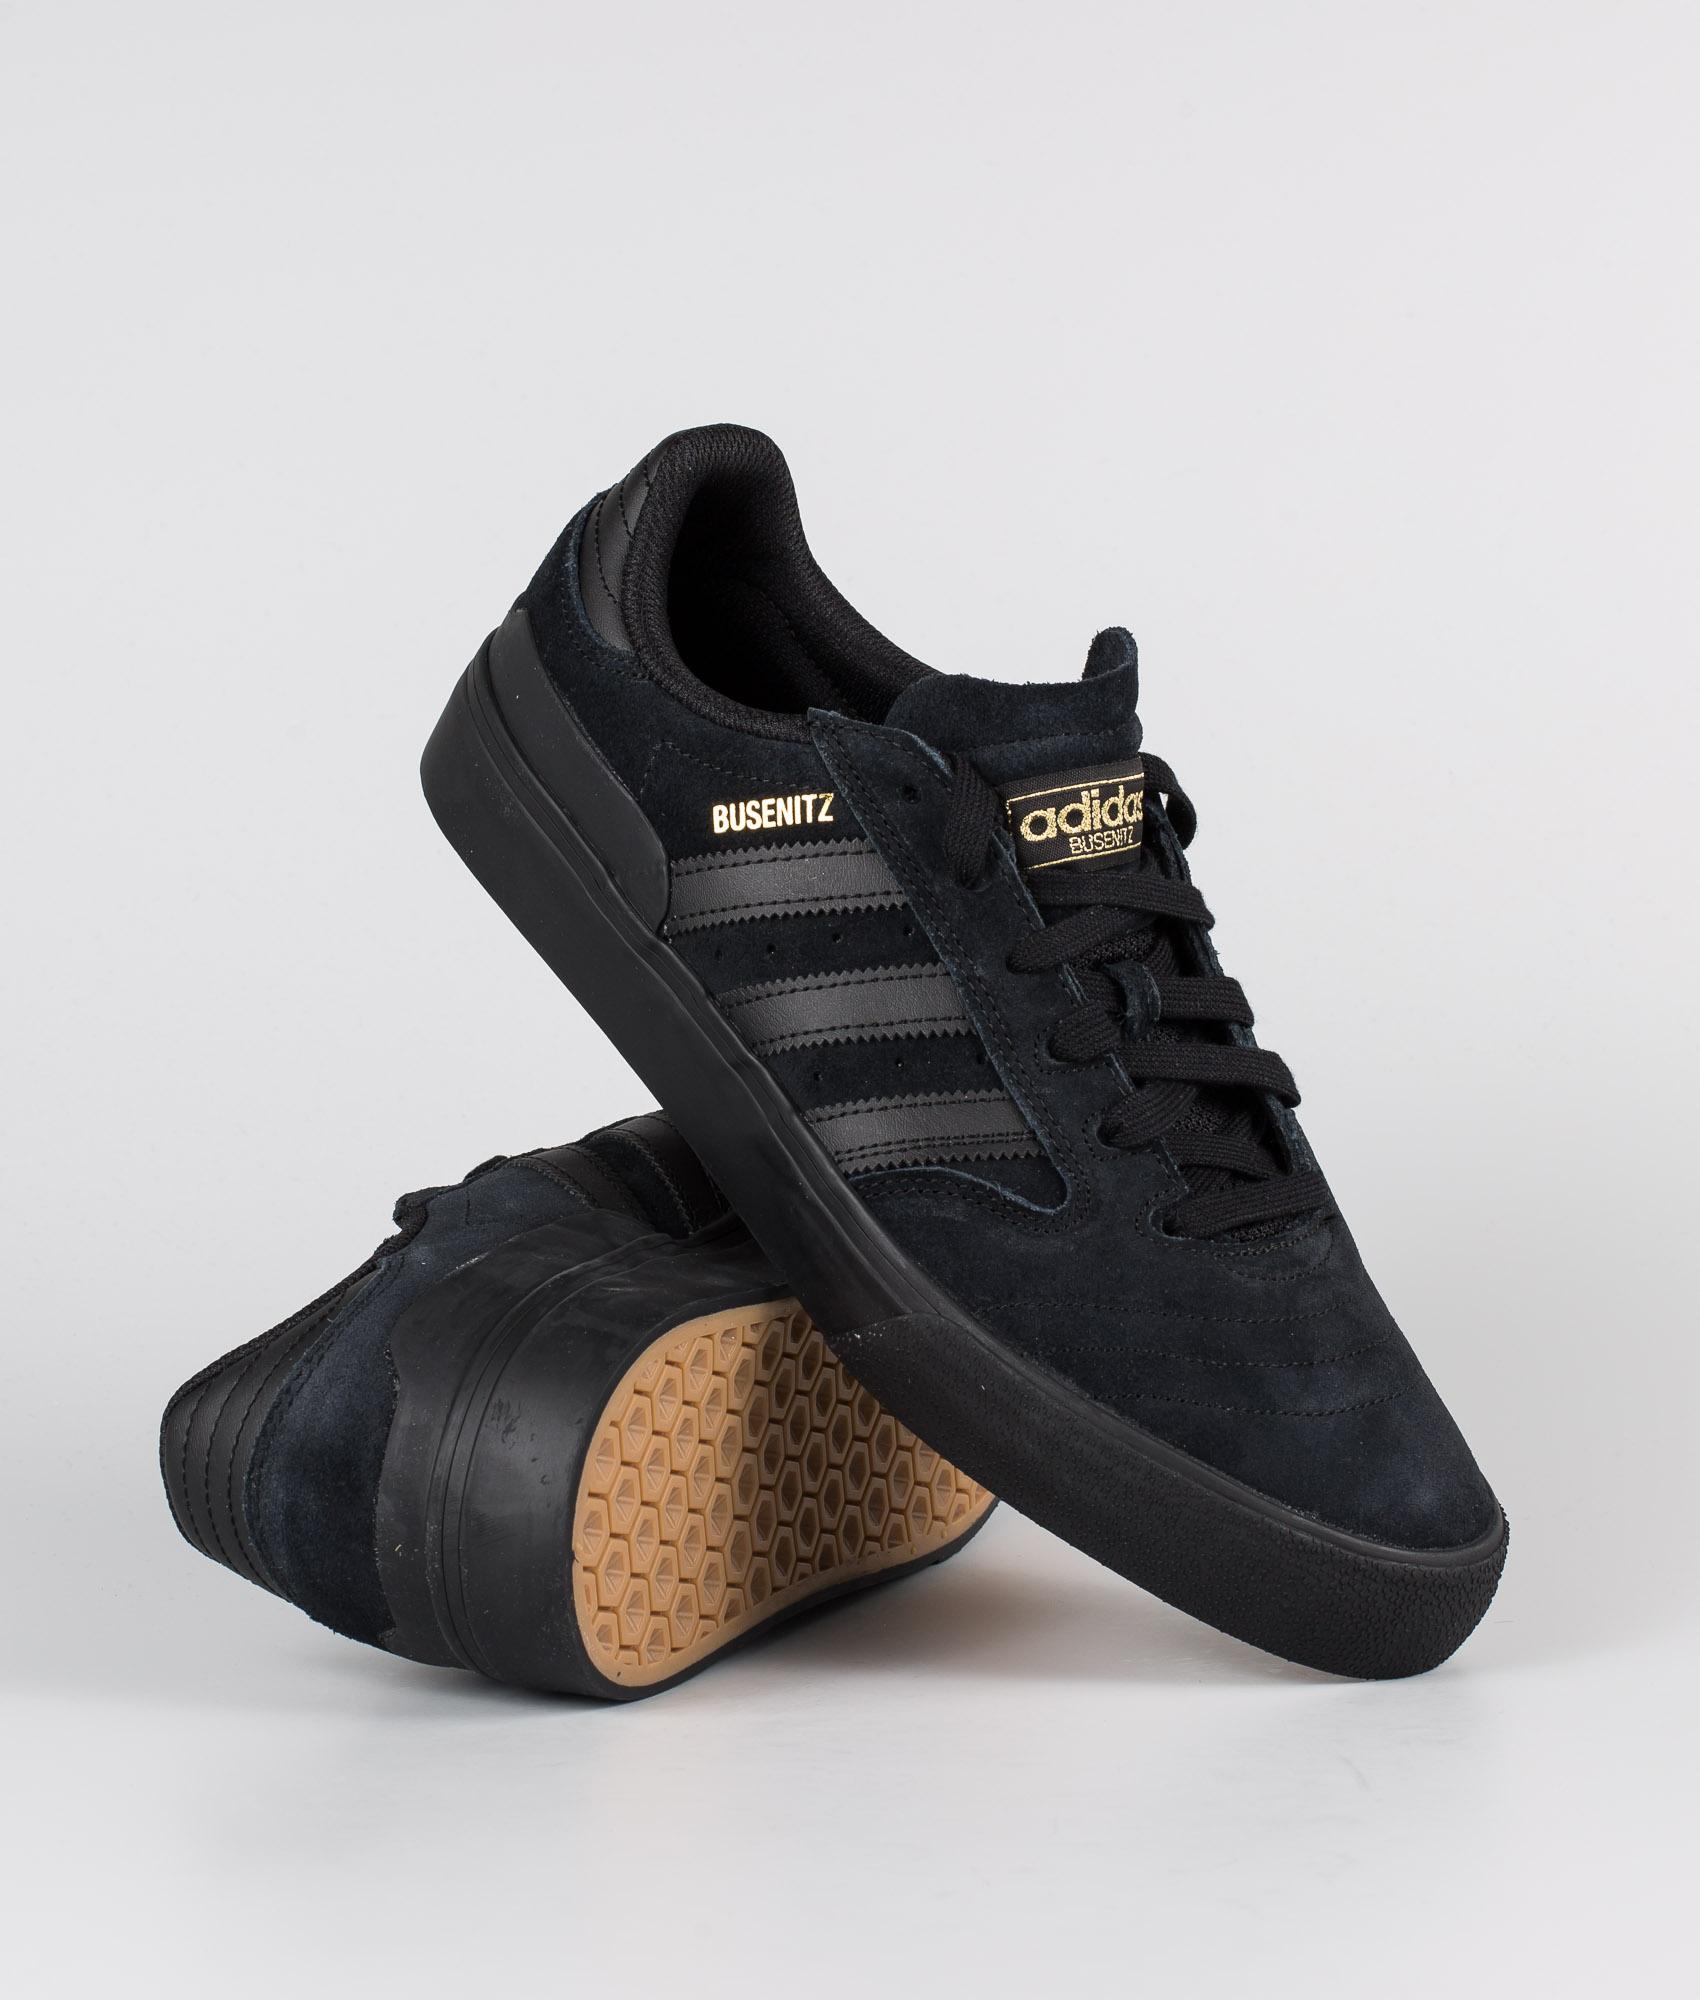 Estallar Aterrador Cuidado  Adidas Skateboarding Busenitz Vulc II Shoes Core Black/Core Black/Gum4 -  Ridestore.com